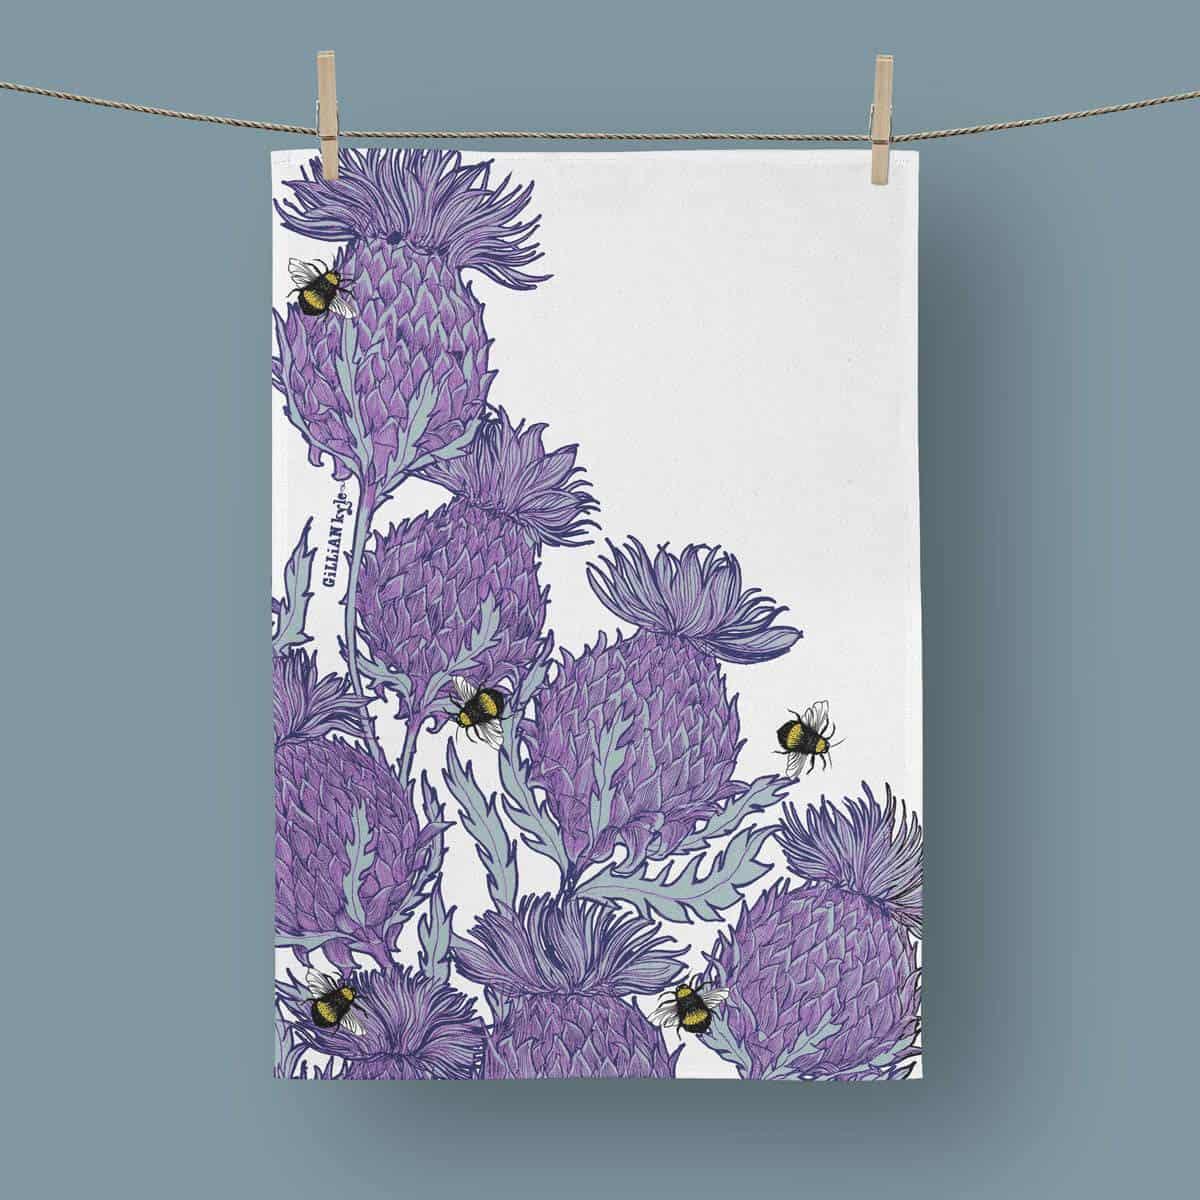 Flower Of Scotland Scottish Thistle Tea Towel By Scottish Artist